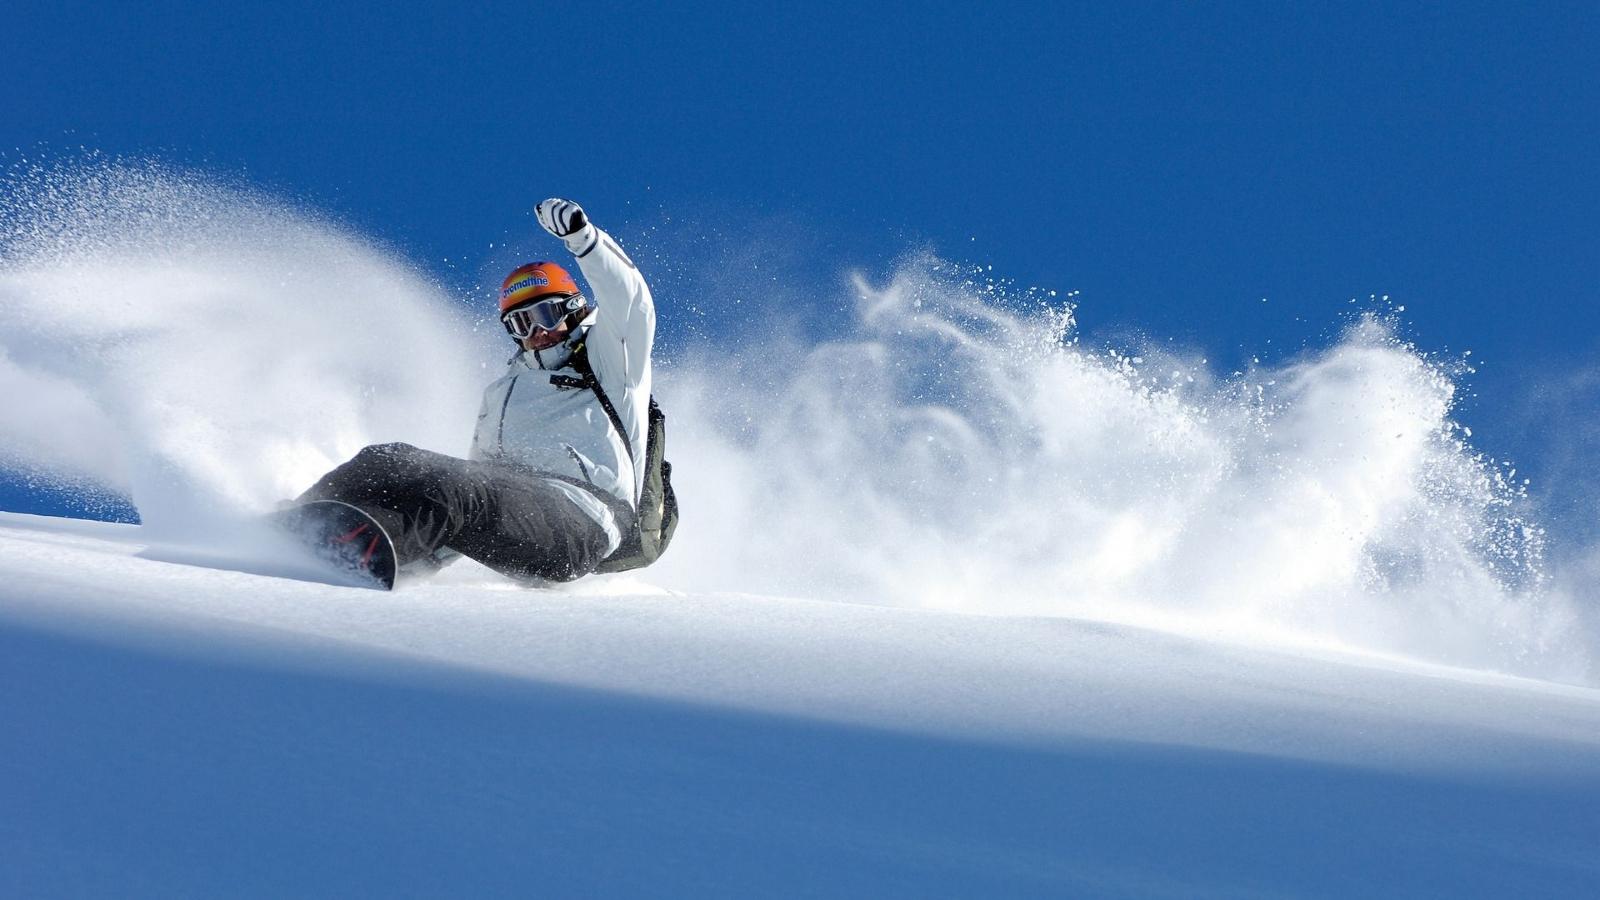 http://1.bp.blogspot.com/-B_VaCGrB5kc/Tw0ovxacSmI/AAAAAAAABUA/vxVUUSeyNkQ/s1600/Snowboarding+Wallpaper+6.jpg